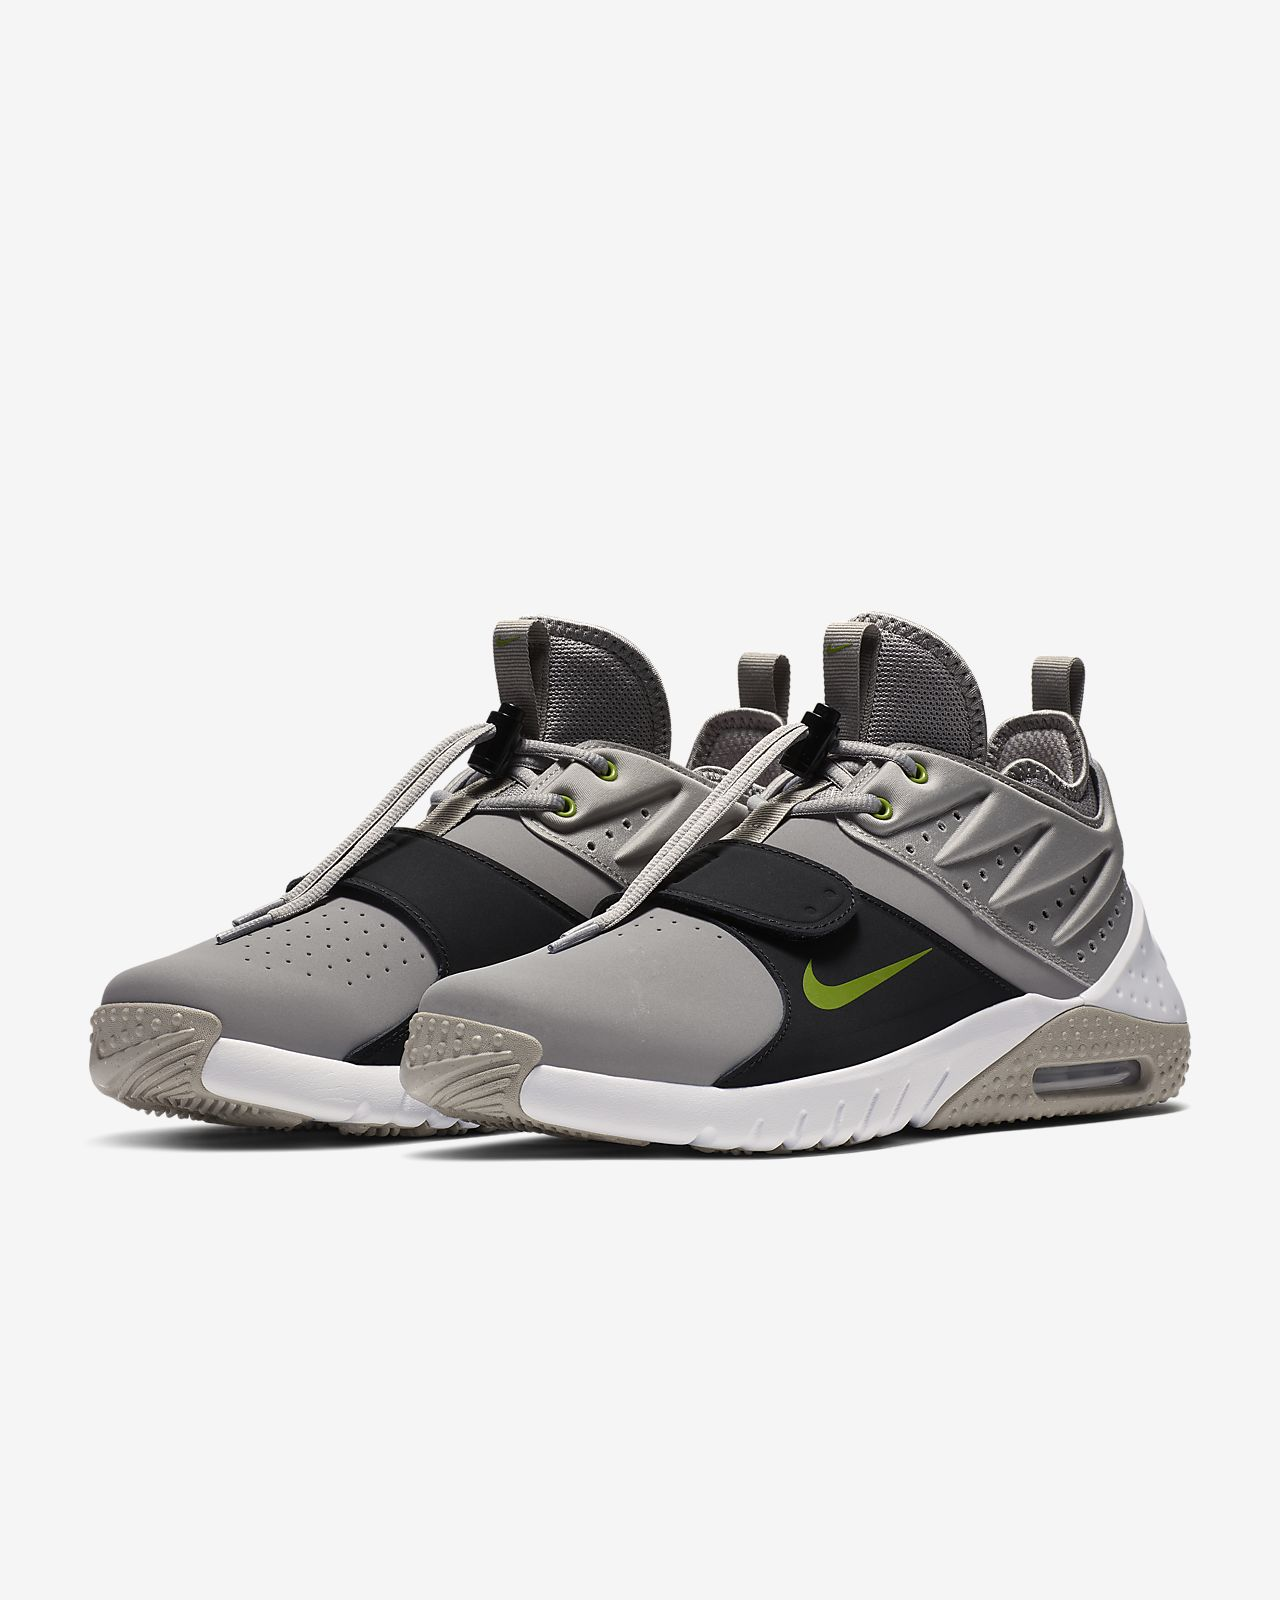 size 40 7c275 cc619 Nike Air Max Trainer 1 Mens Training Shoe ...